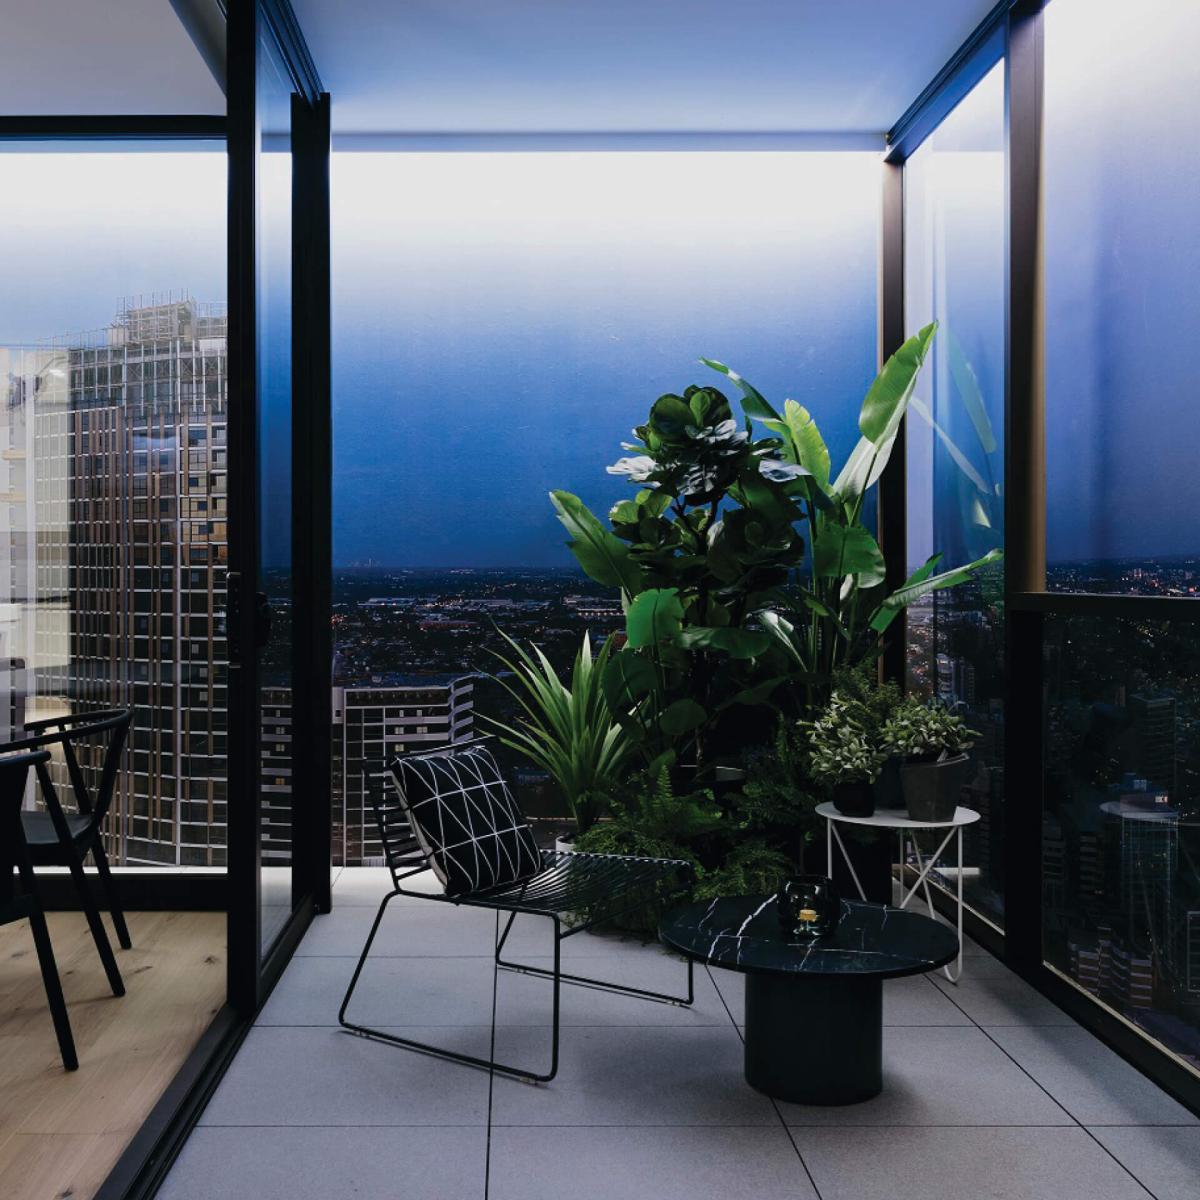 Coronation-Property-Parramatta-8-Phillip-Street_355215_large.jpg